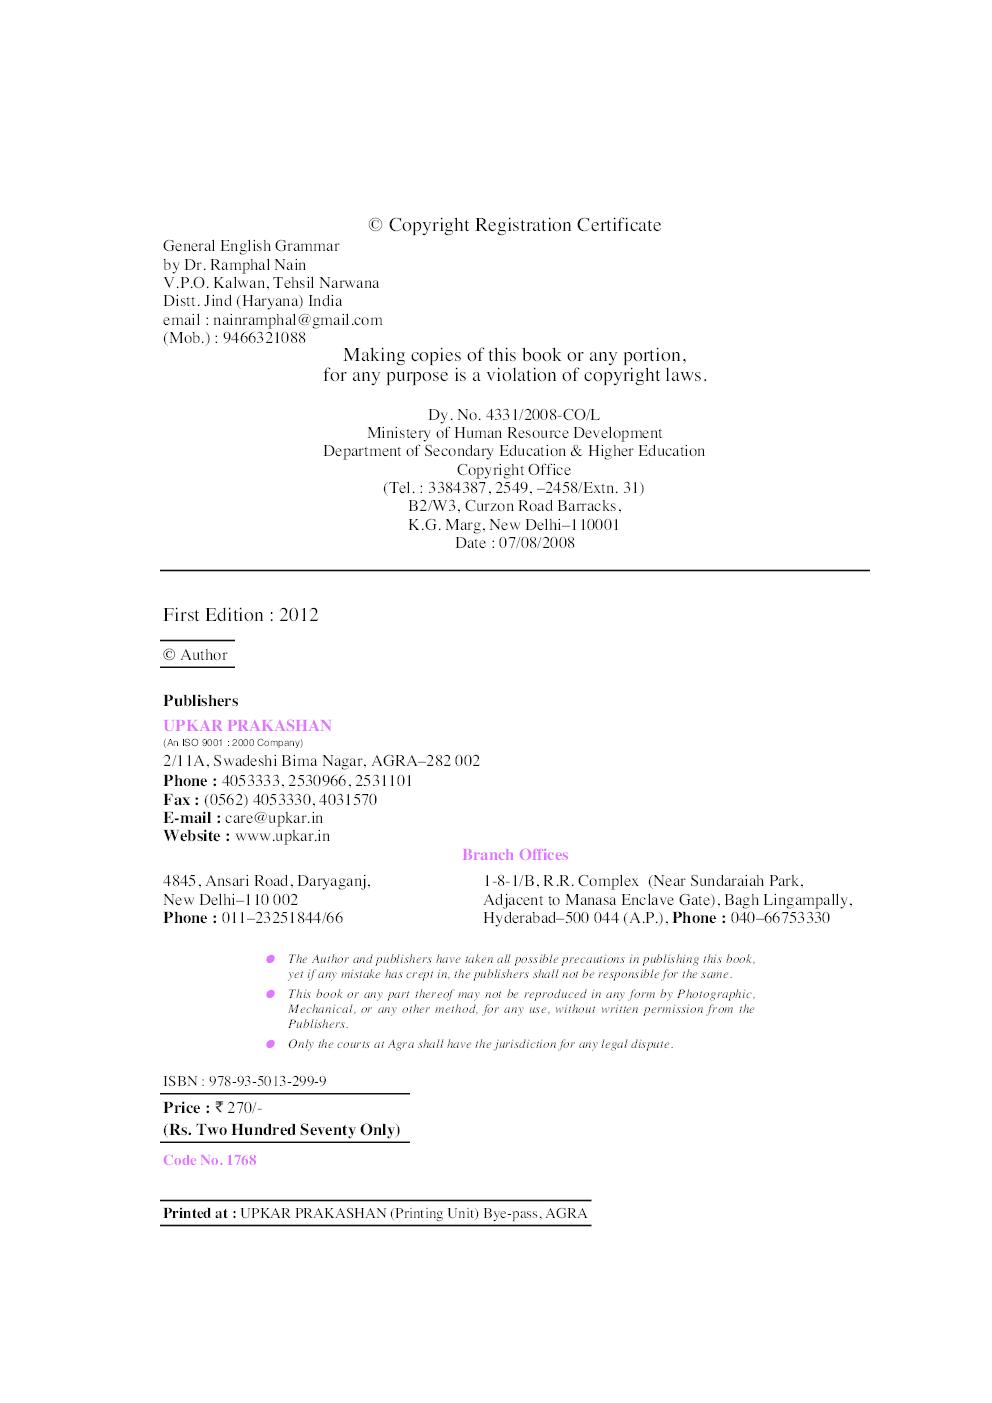 General English Grammar - Page 3